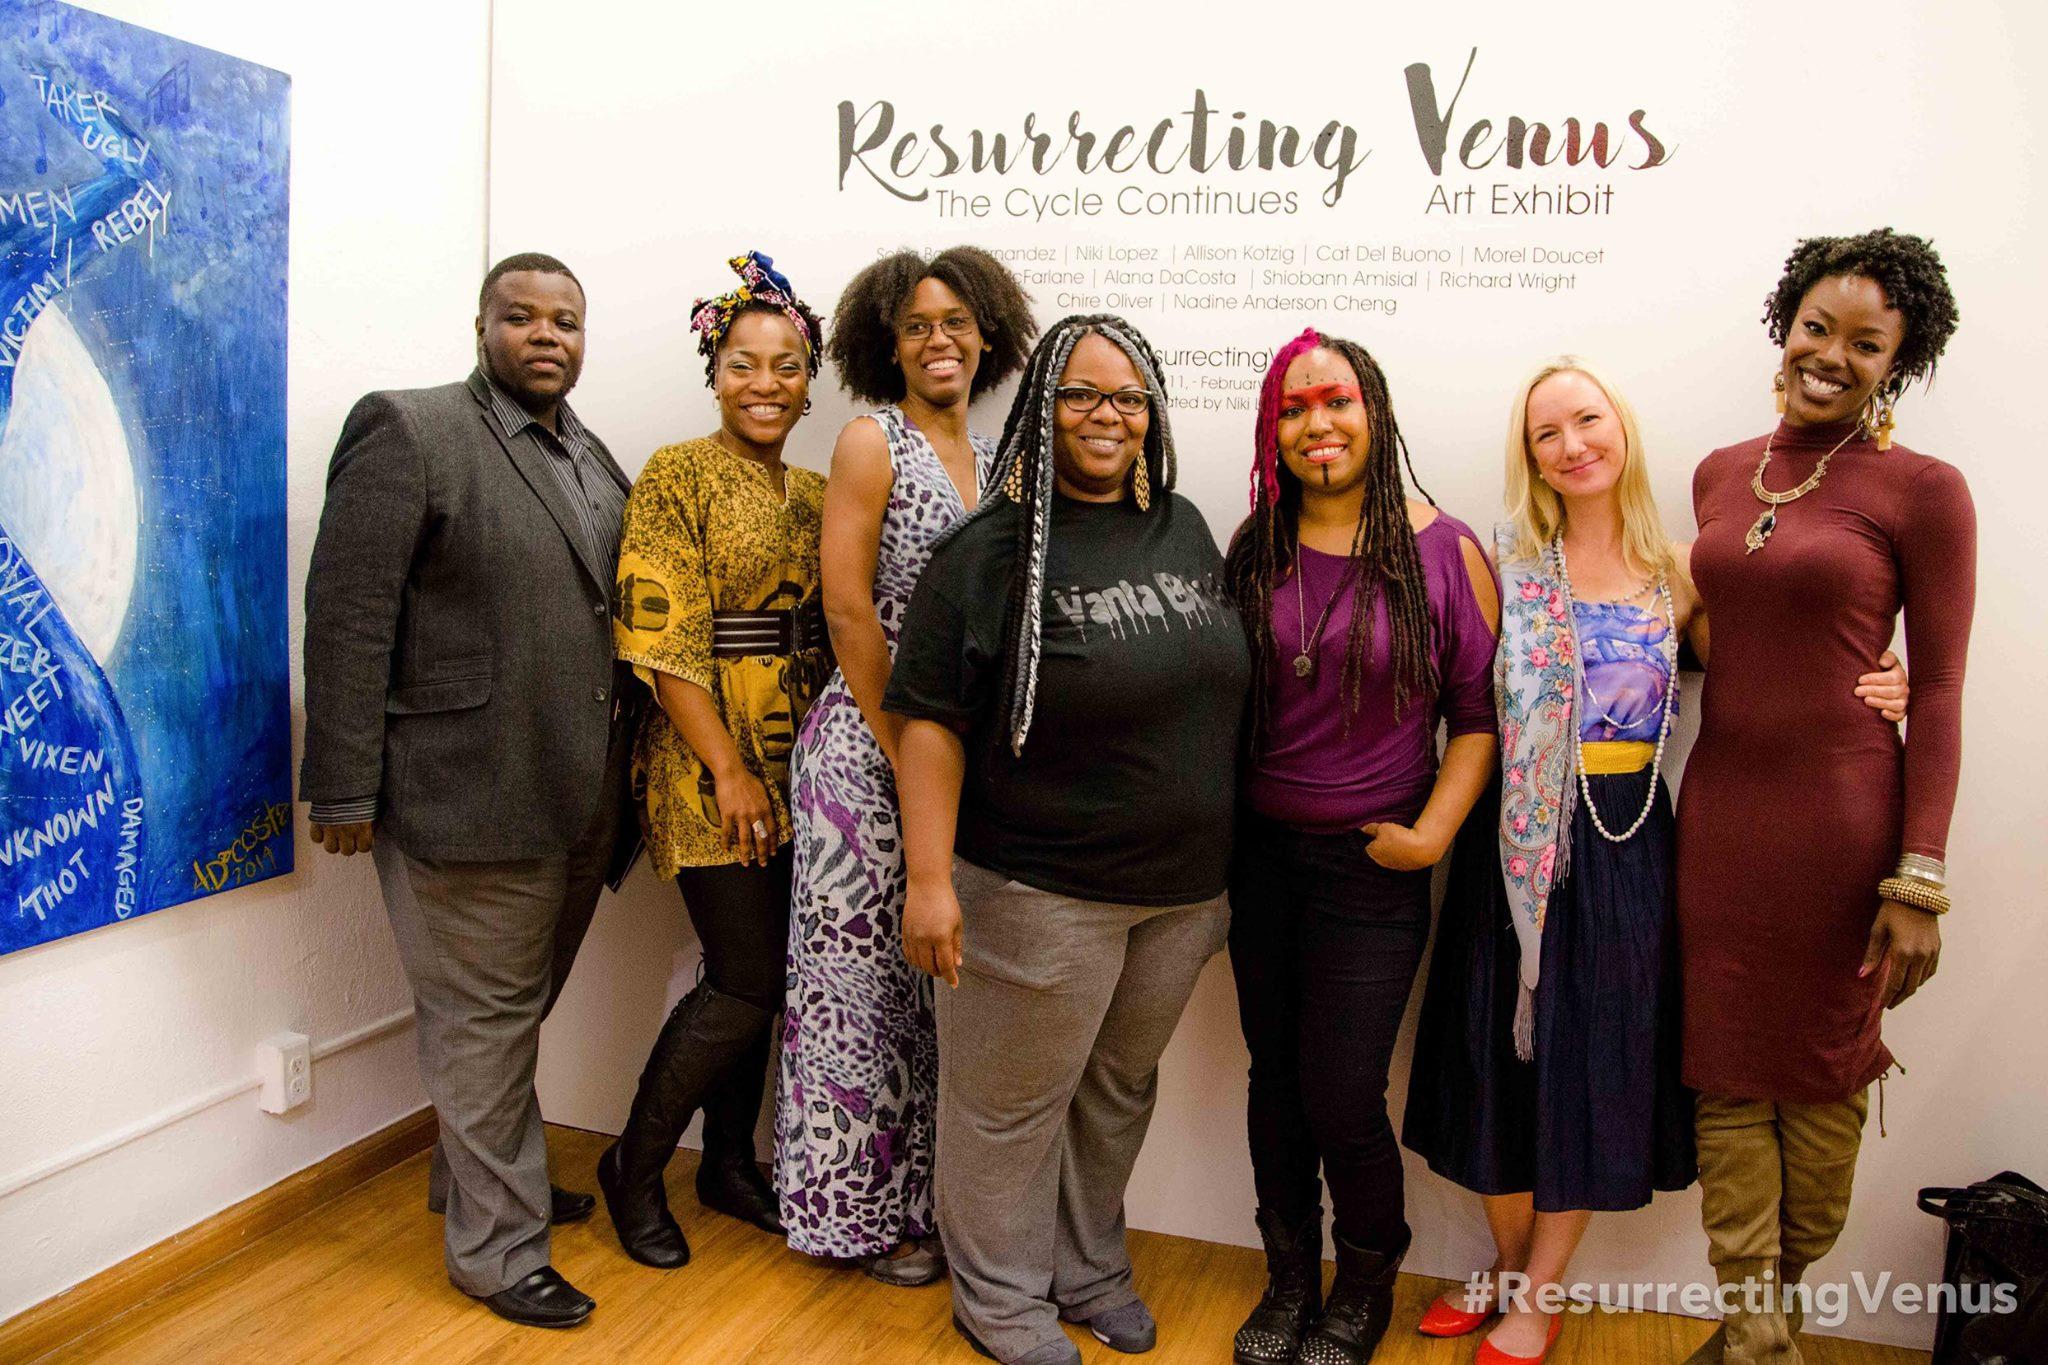 Exhibiting artists of Resurrecting Venus - curator: Niki Lopez